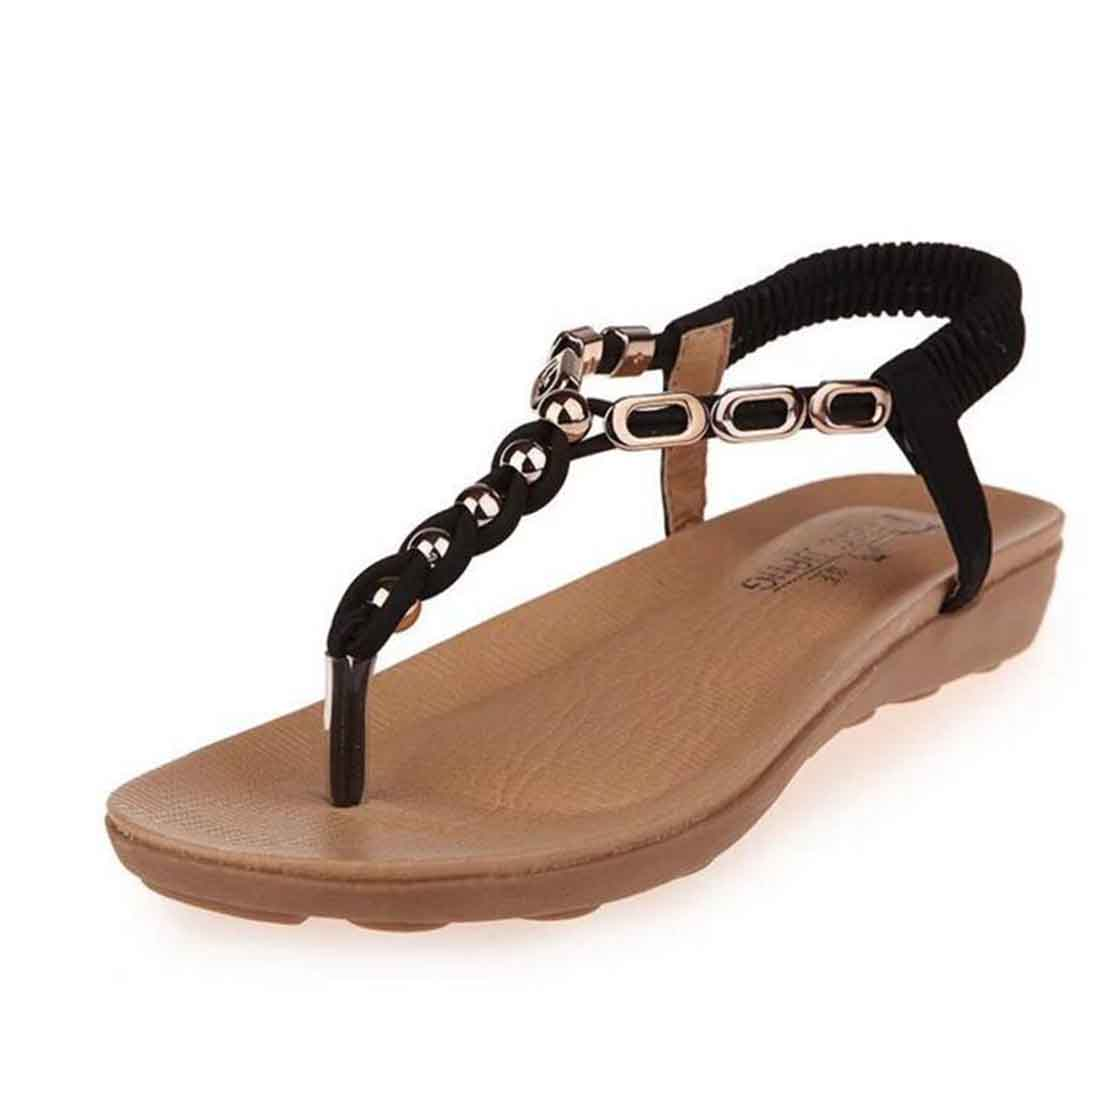 Woman 2017 New Summer Flat Sandals Ladies Summer Bohemia Beach Flip Flops Shoes Women Shoes Sandles Zapatos Mujer Sandalias 2017 women sandals new fashion bohemia style ankle strap flip flops summer flat shoes woman ladies shoes sandalias mujer d35m4